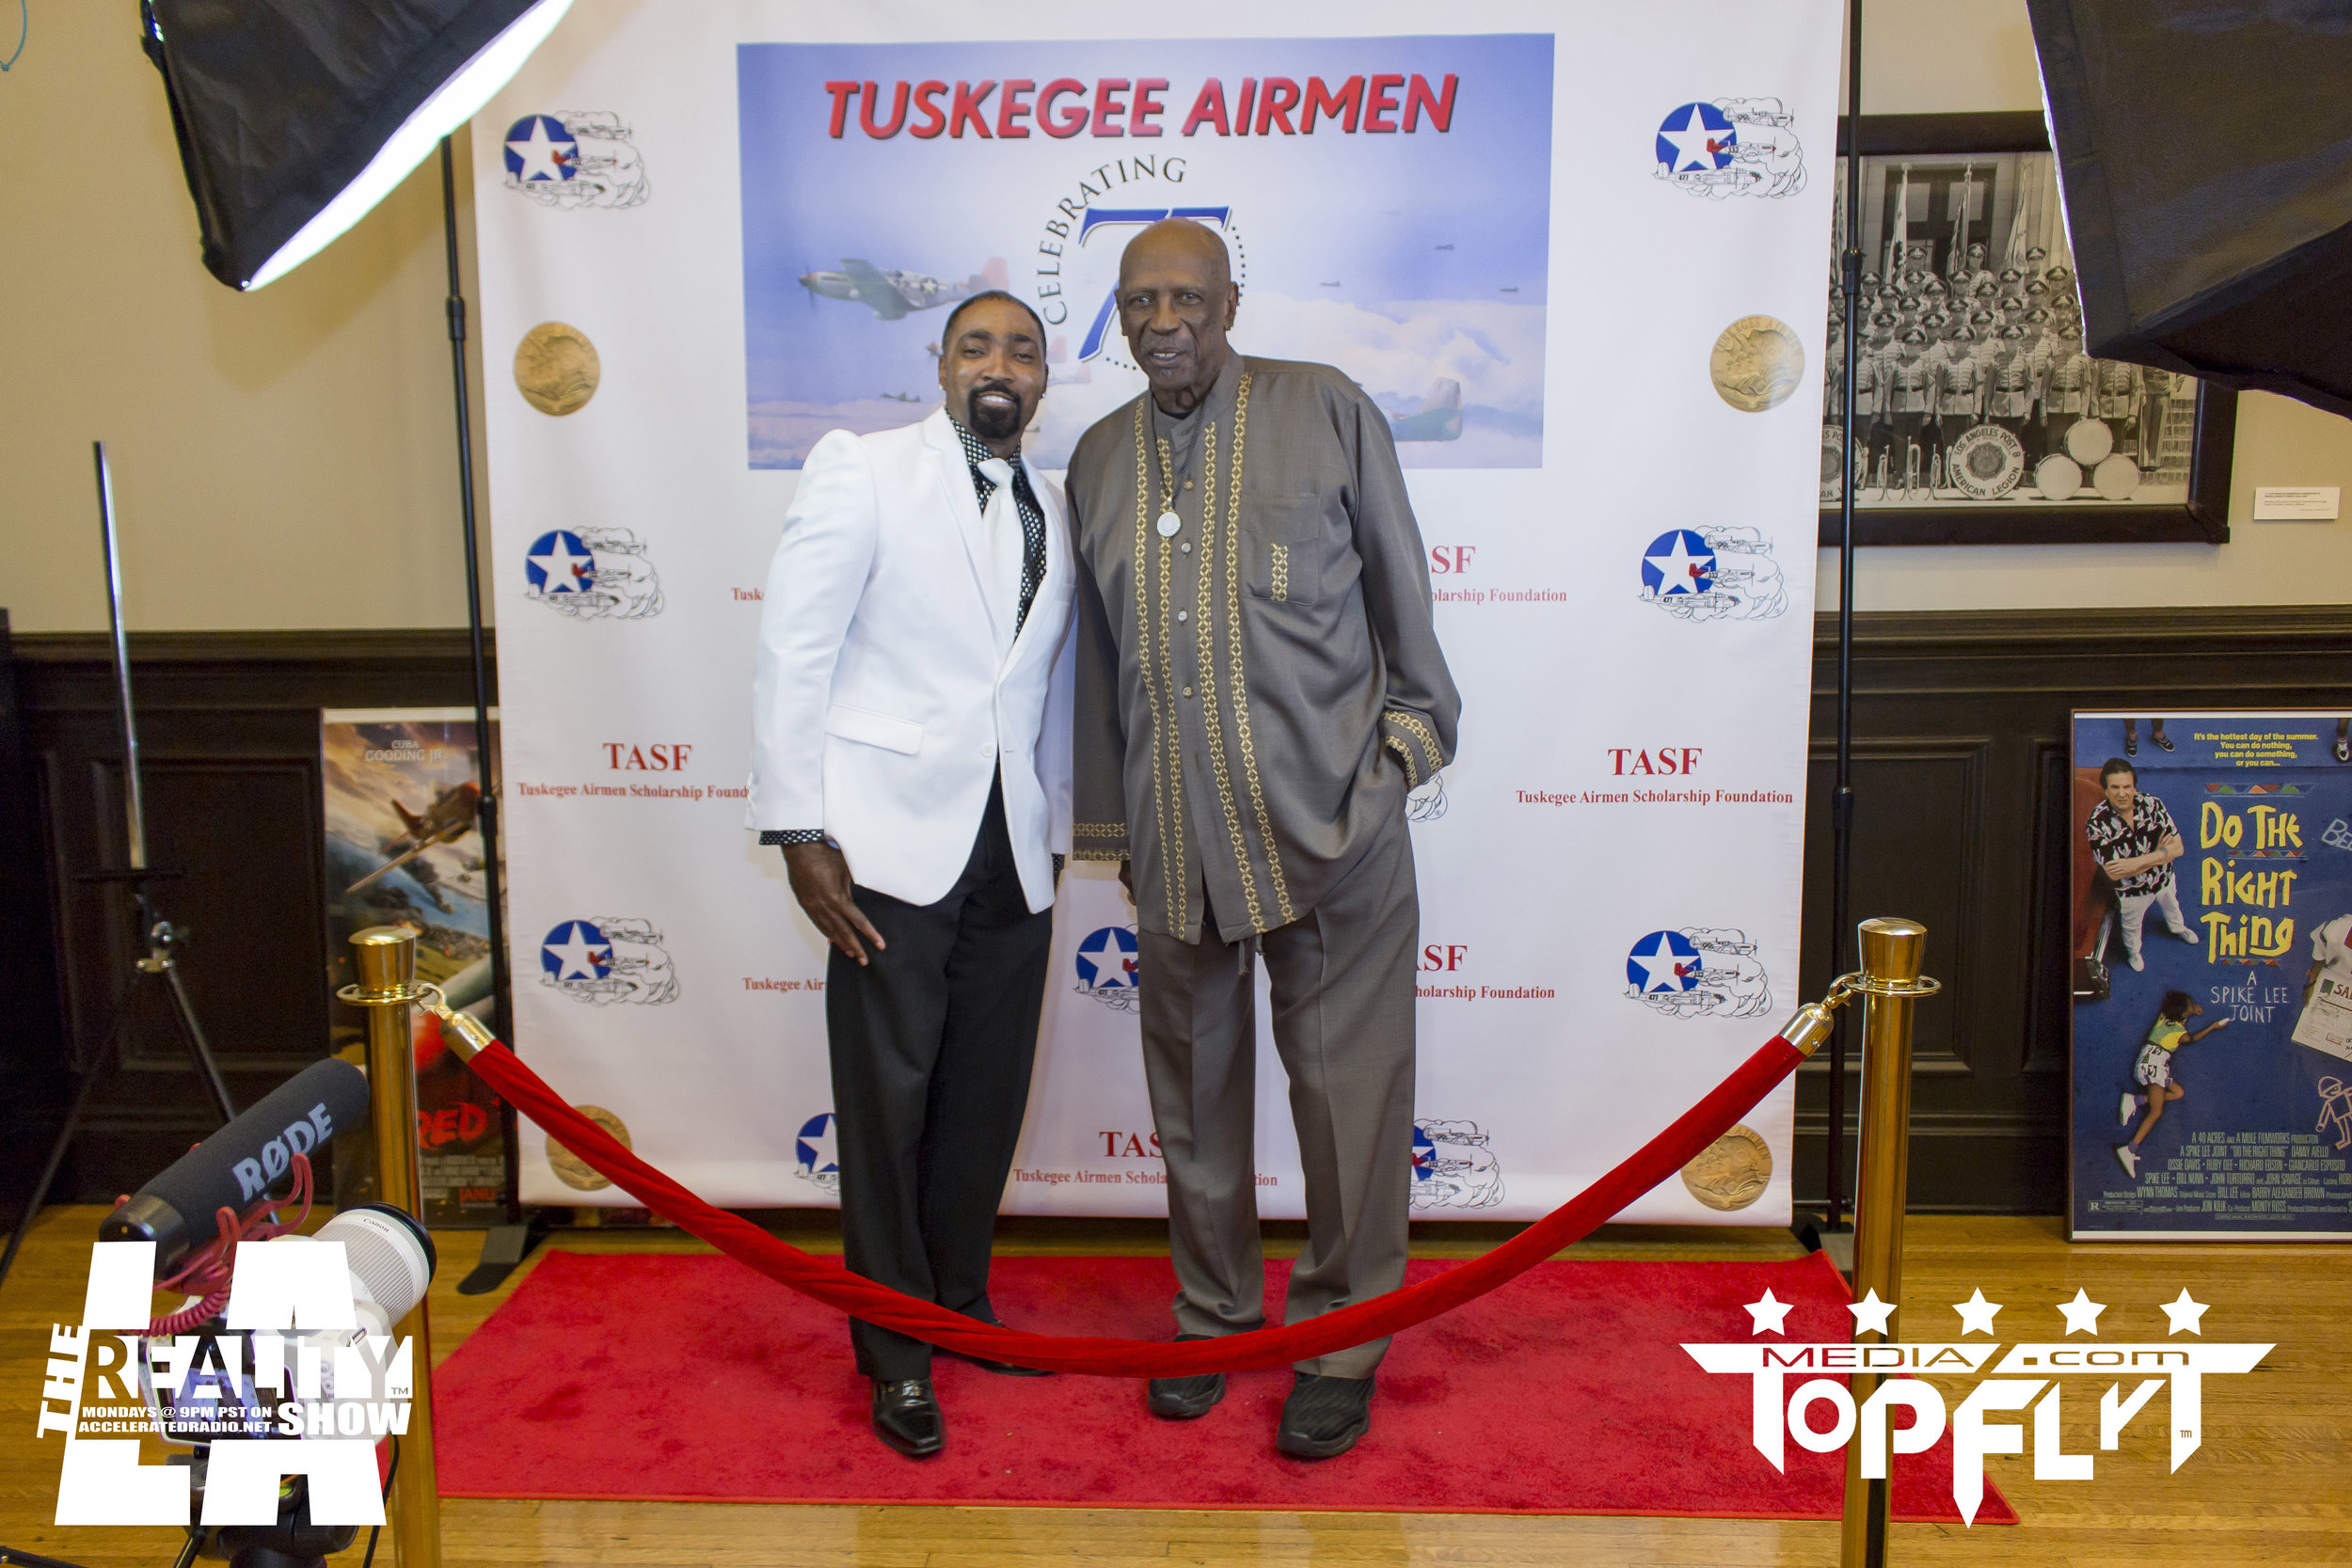 The Reality Show LA - Tuskegee Airmen 75th Anniversary VIP Reception_74.jpg